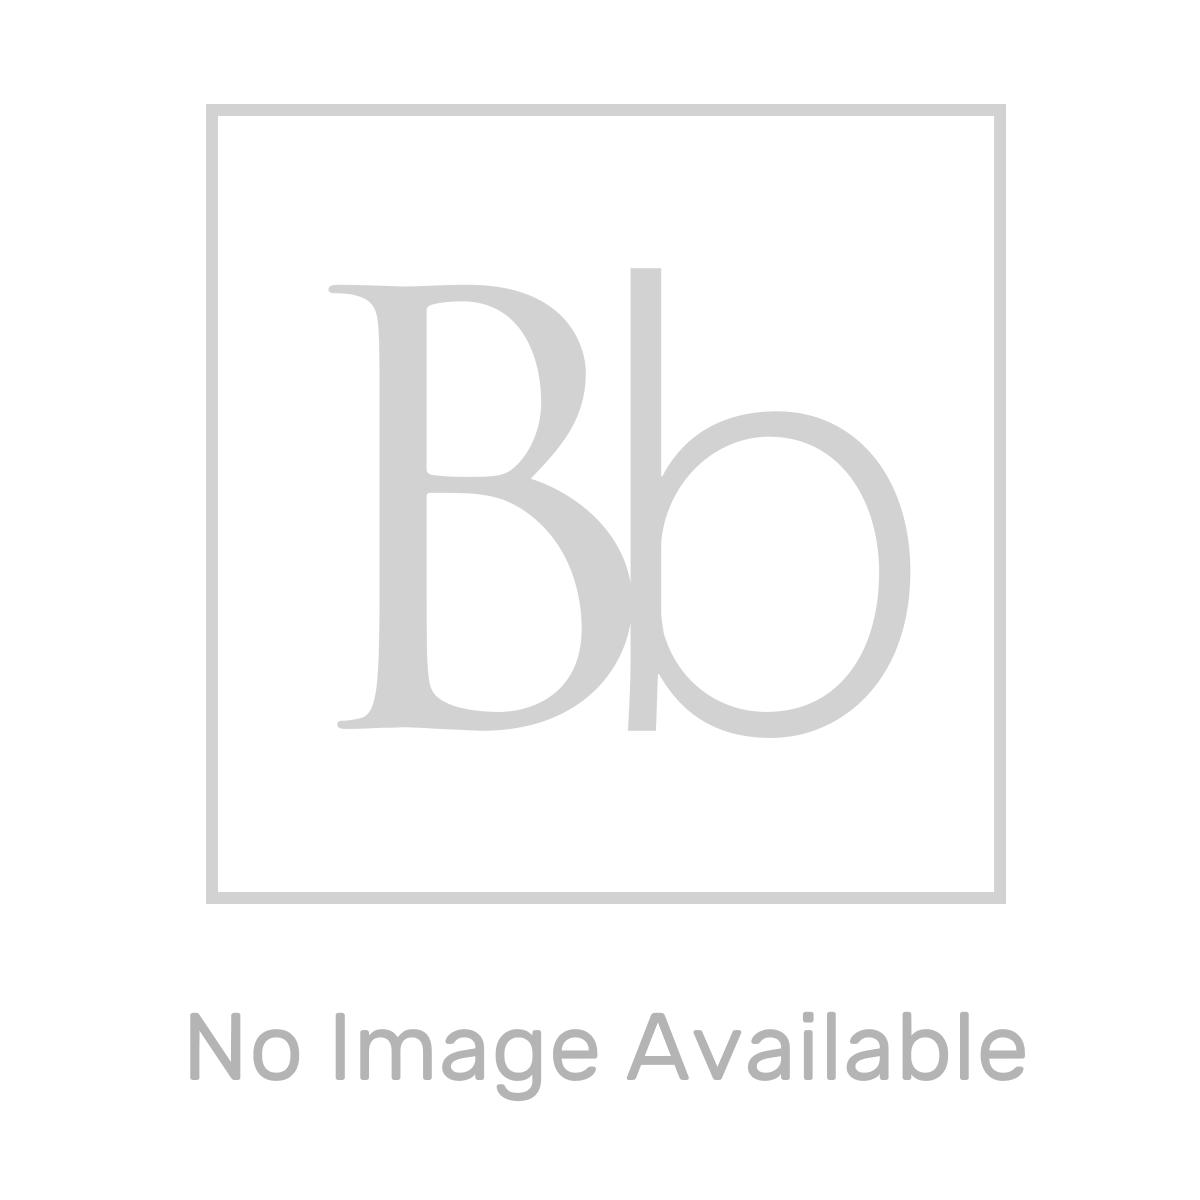 BTL Volta White Gloss Floor Standing 2 Door Tall Unit 300mm